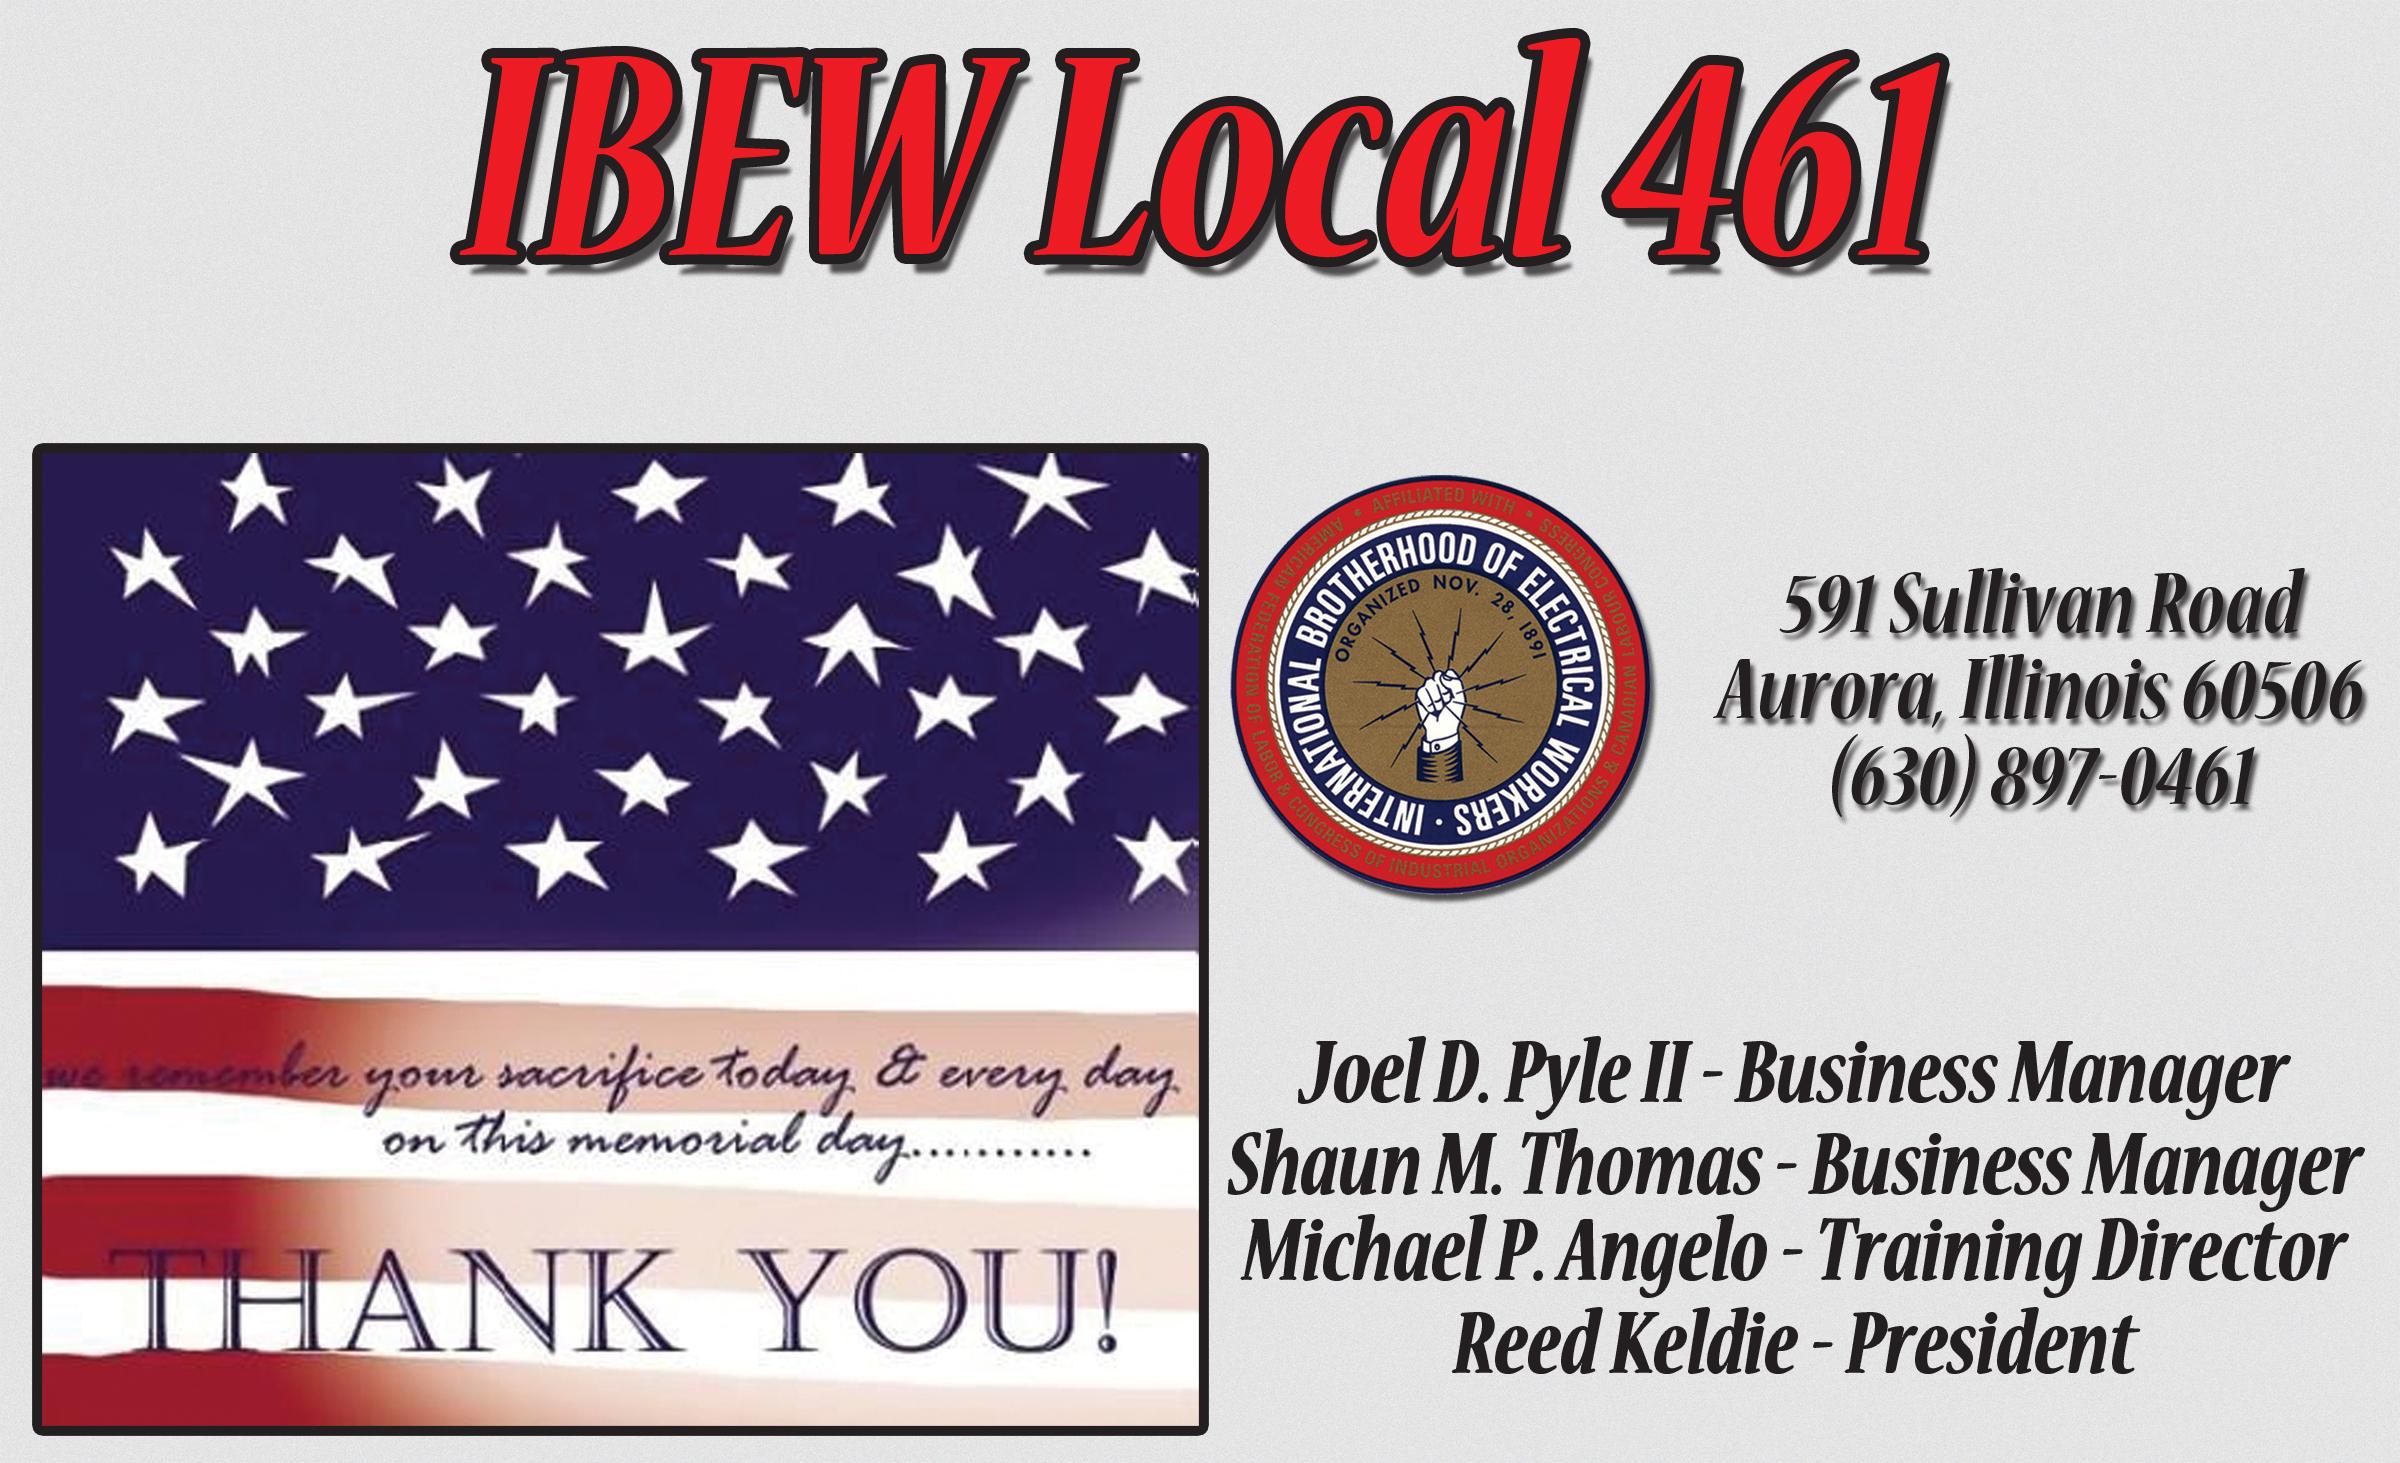 IBEW Local 461, Aurora, Ill.